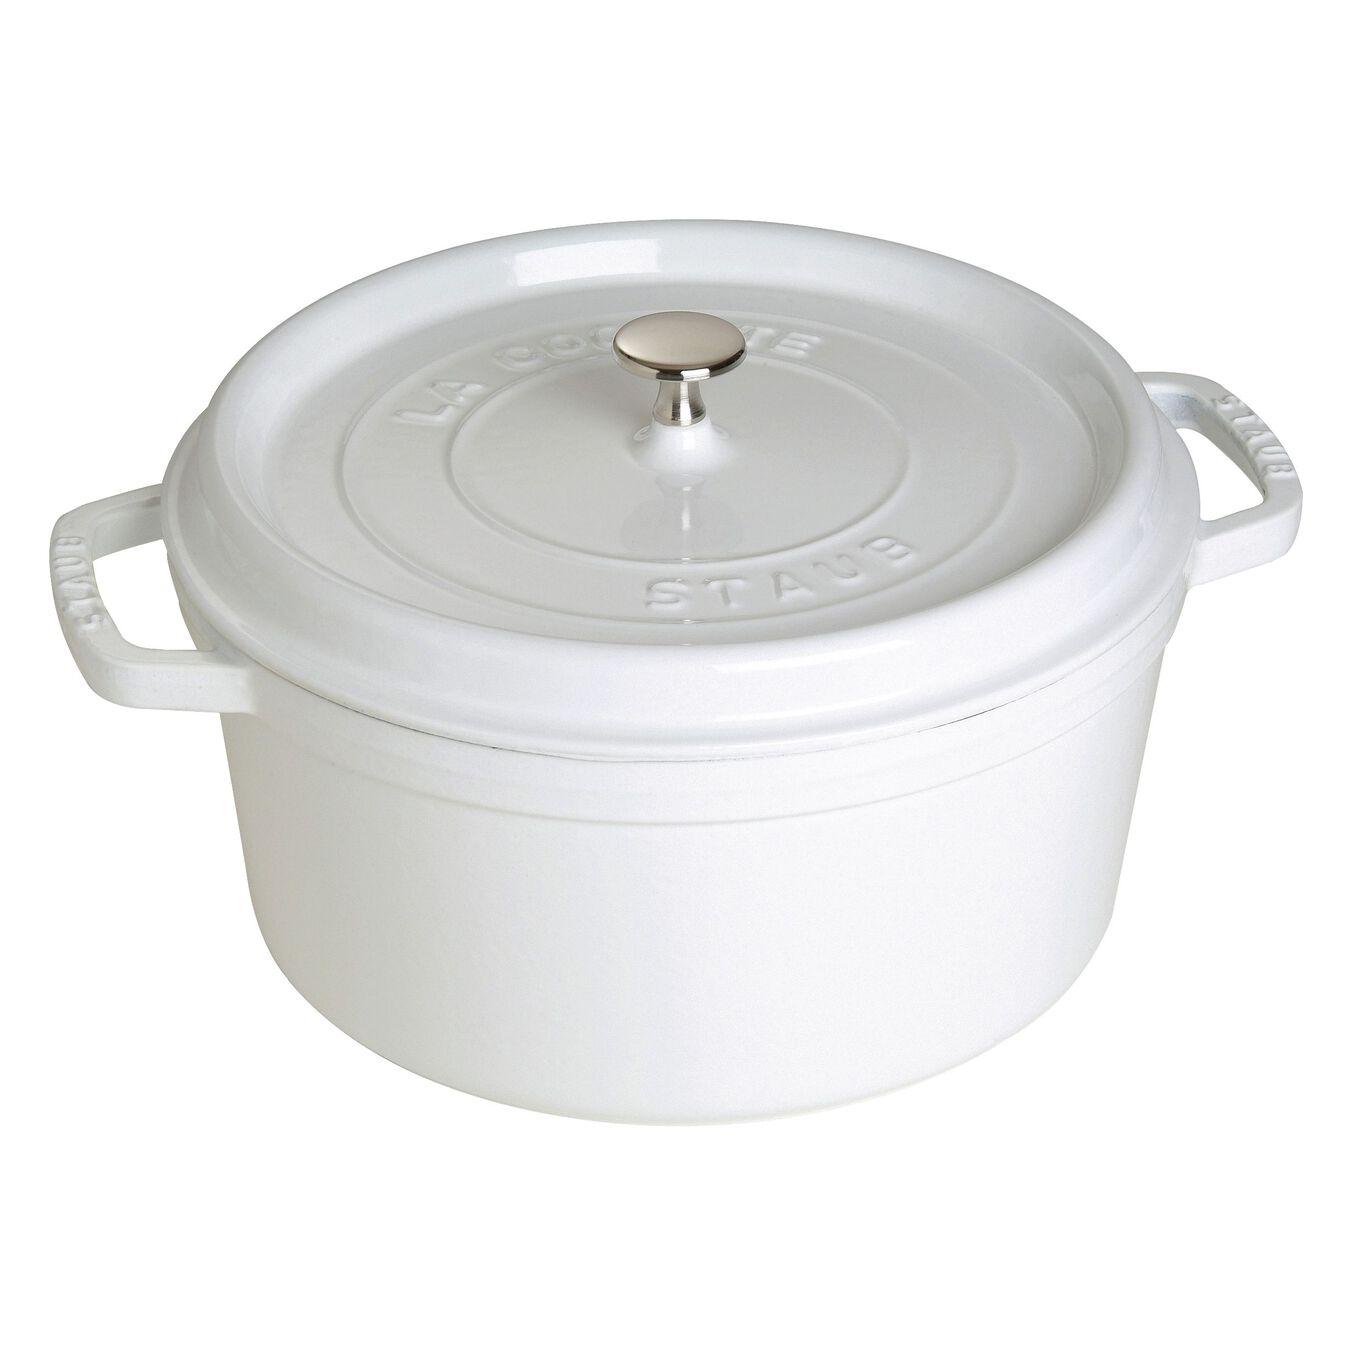 7-qt Round Cocotte - White,,large 1